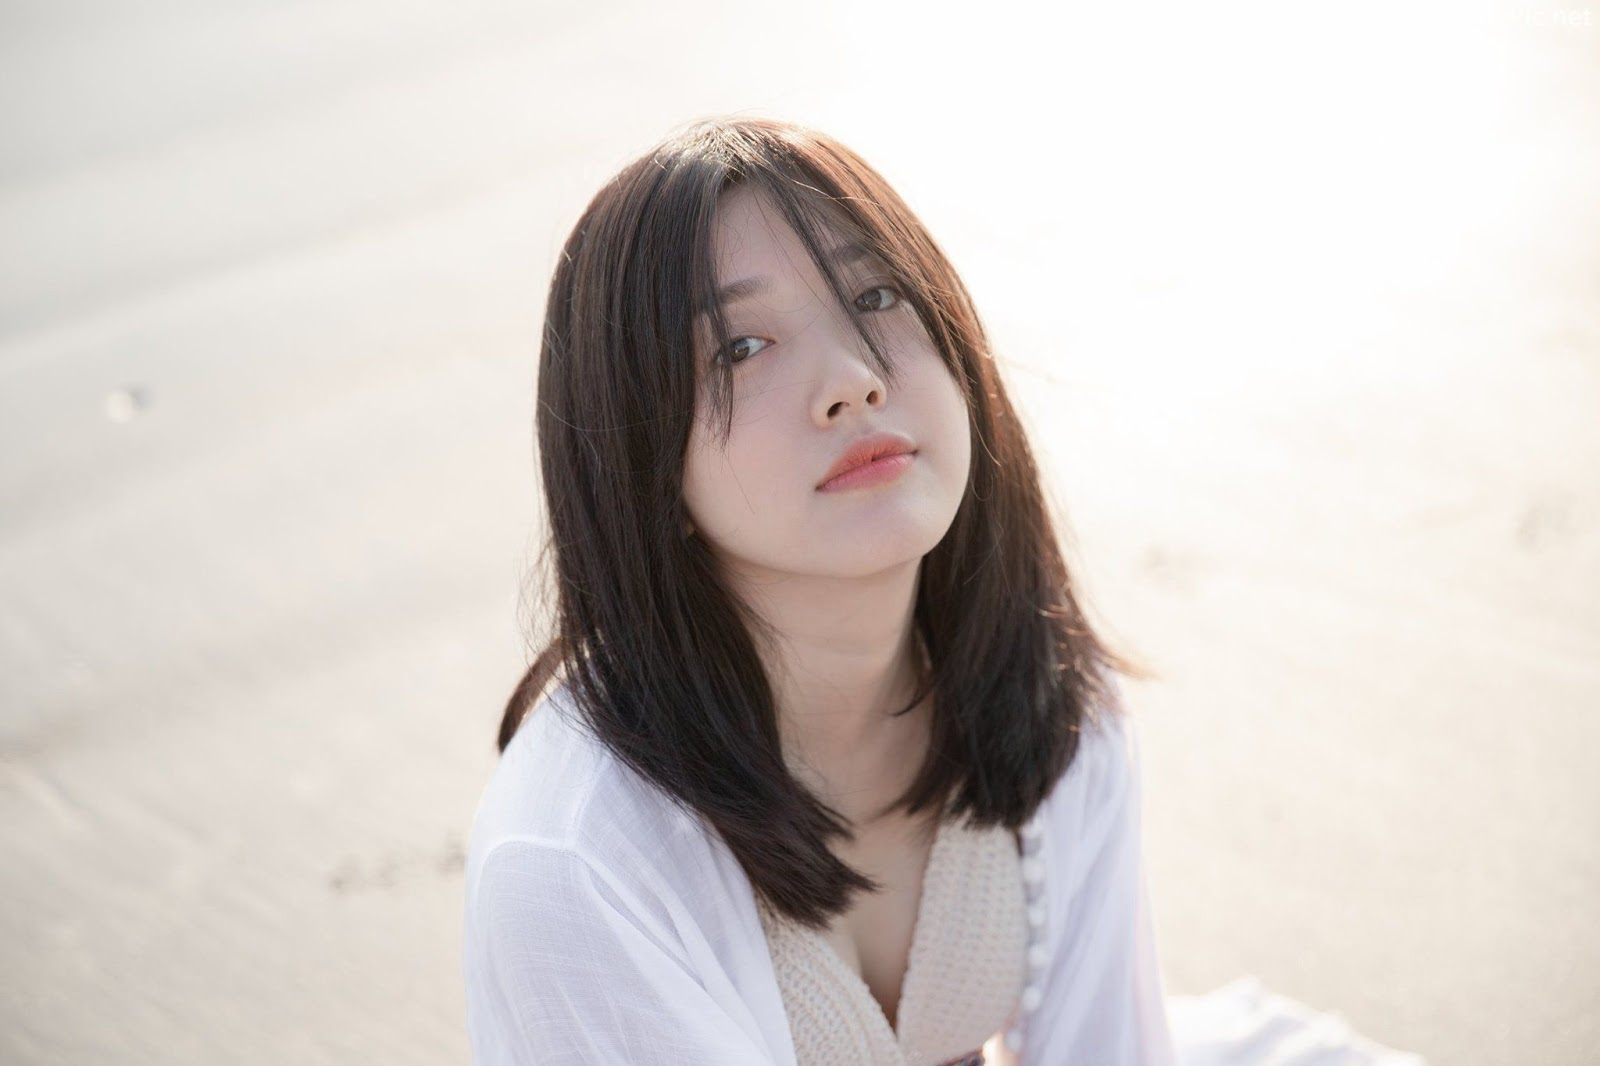 Thailand hot girl Purewarin Kosiriwalanon - Pure beauty and lovely with wool bikini - Picture 9